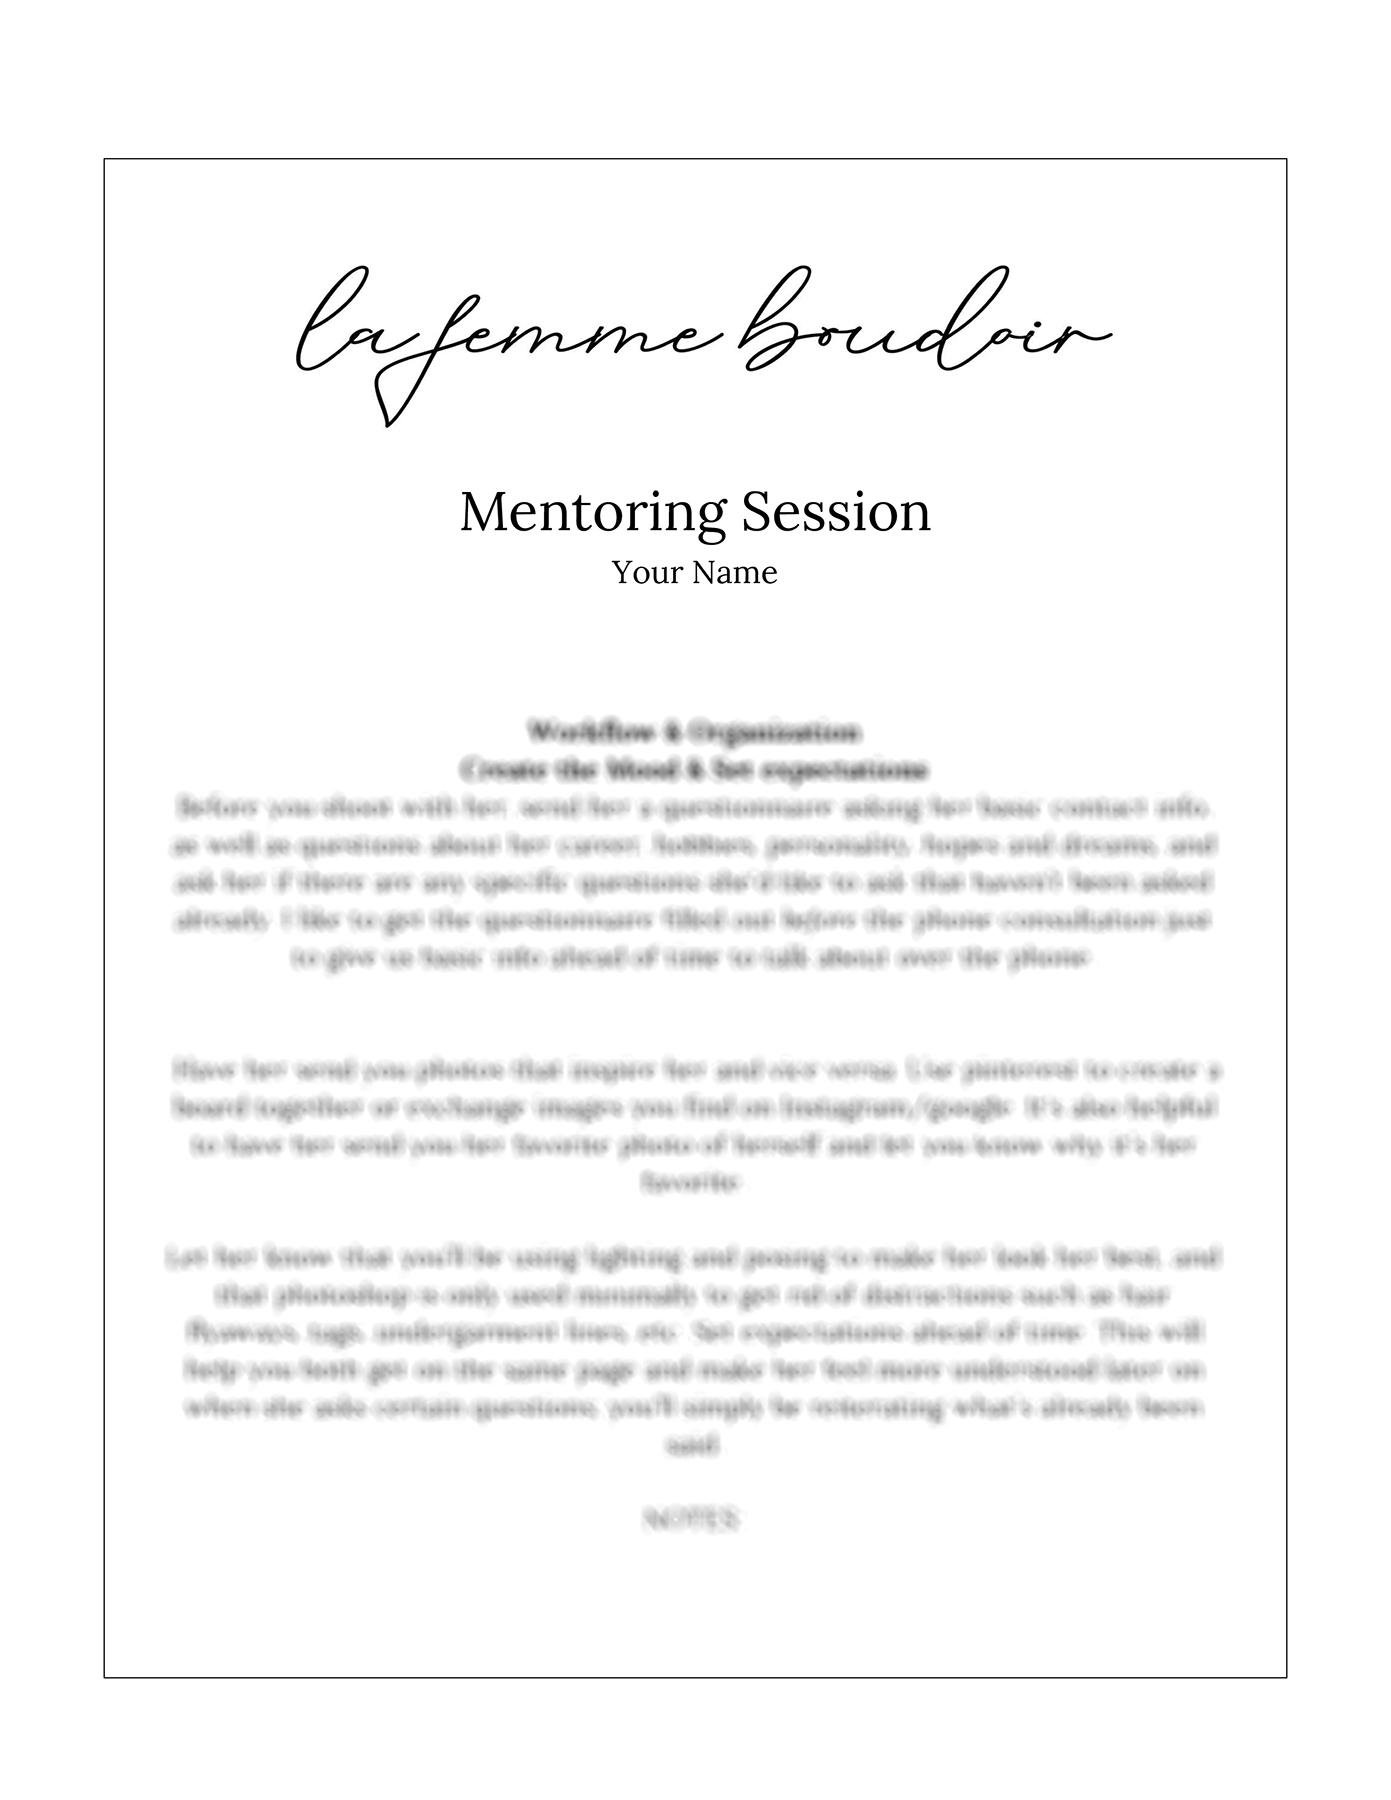 La Femme Boudoir Mentoring Sessions Worksheet